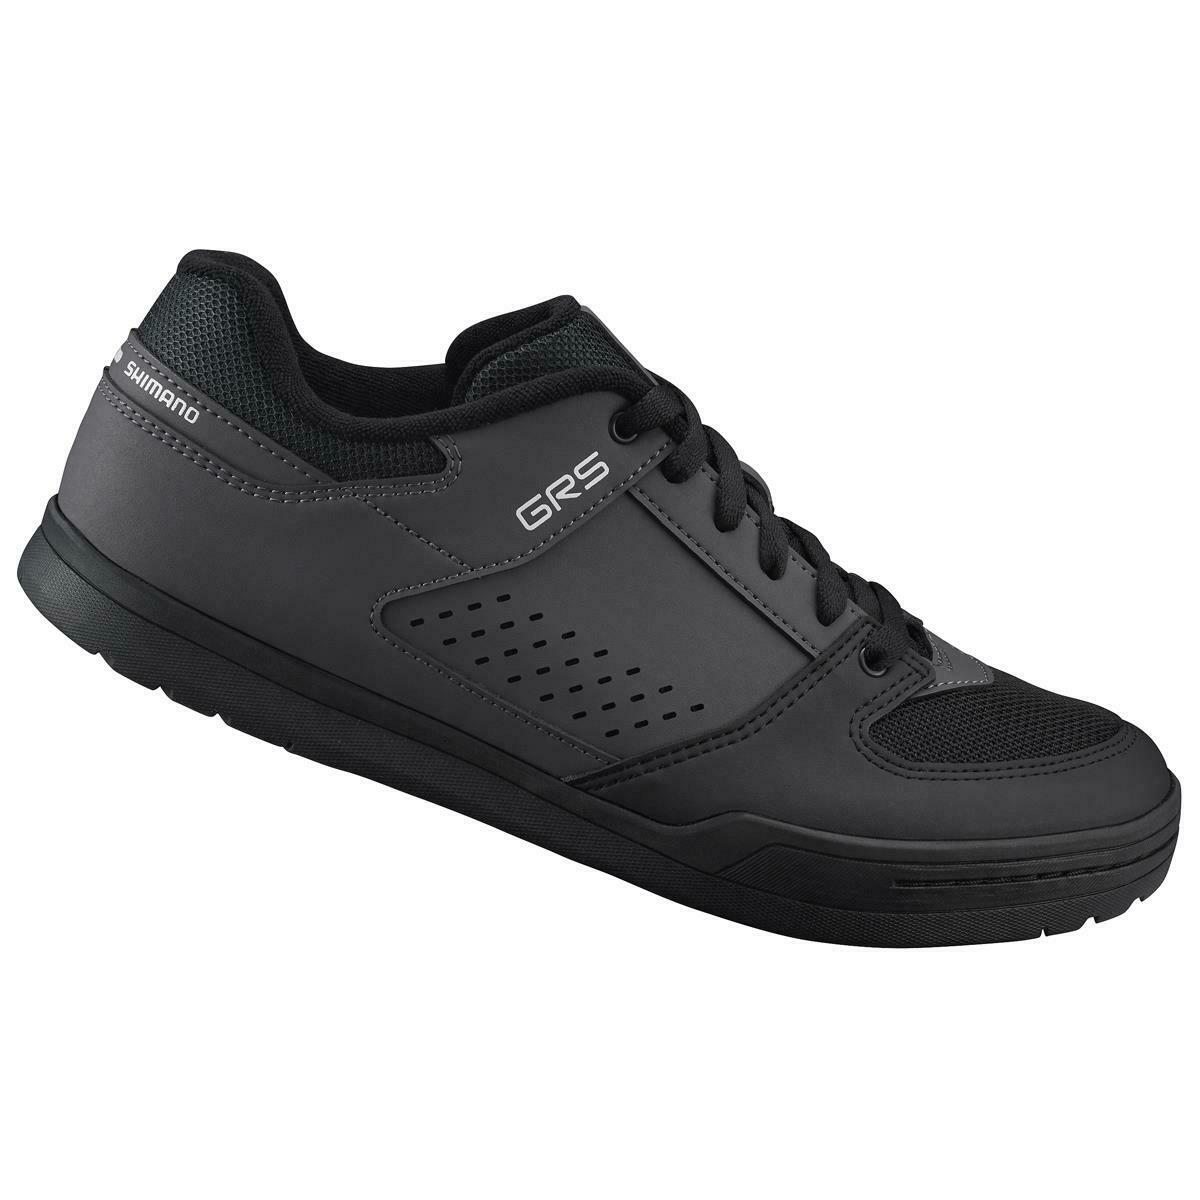 shoes flat mtb sh-gr500sg1 gr500 grey 2019 SHIMANO shoes  bike  quality assurance